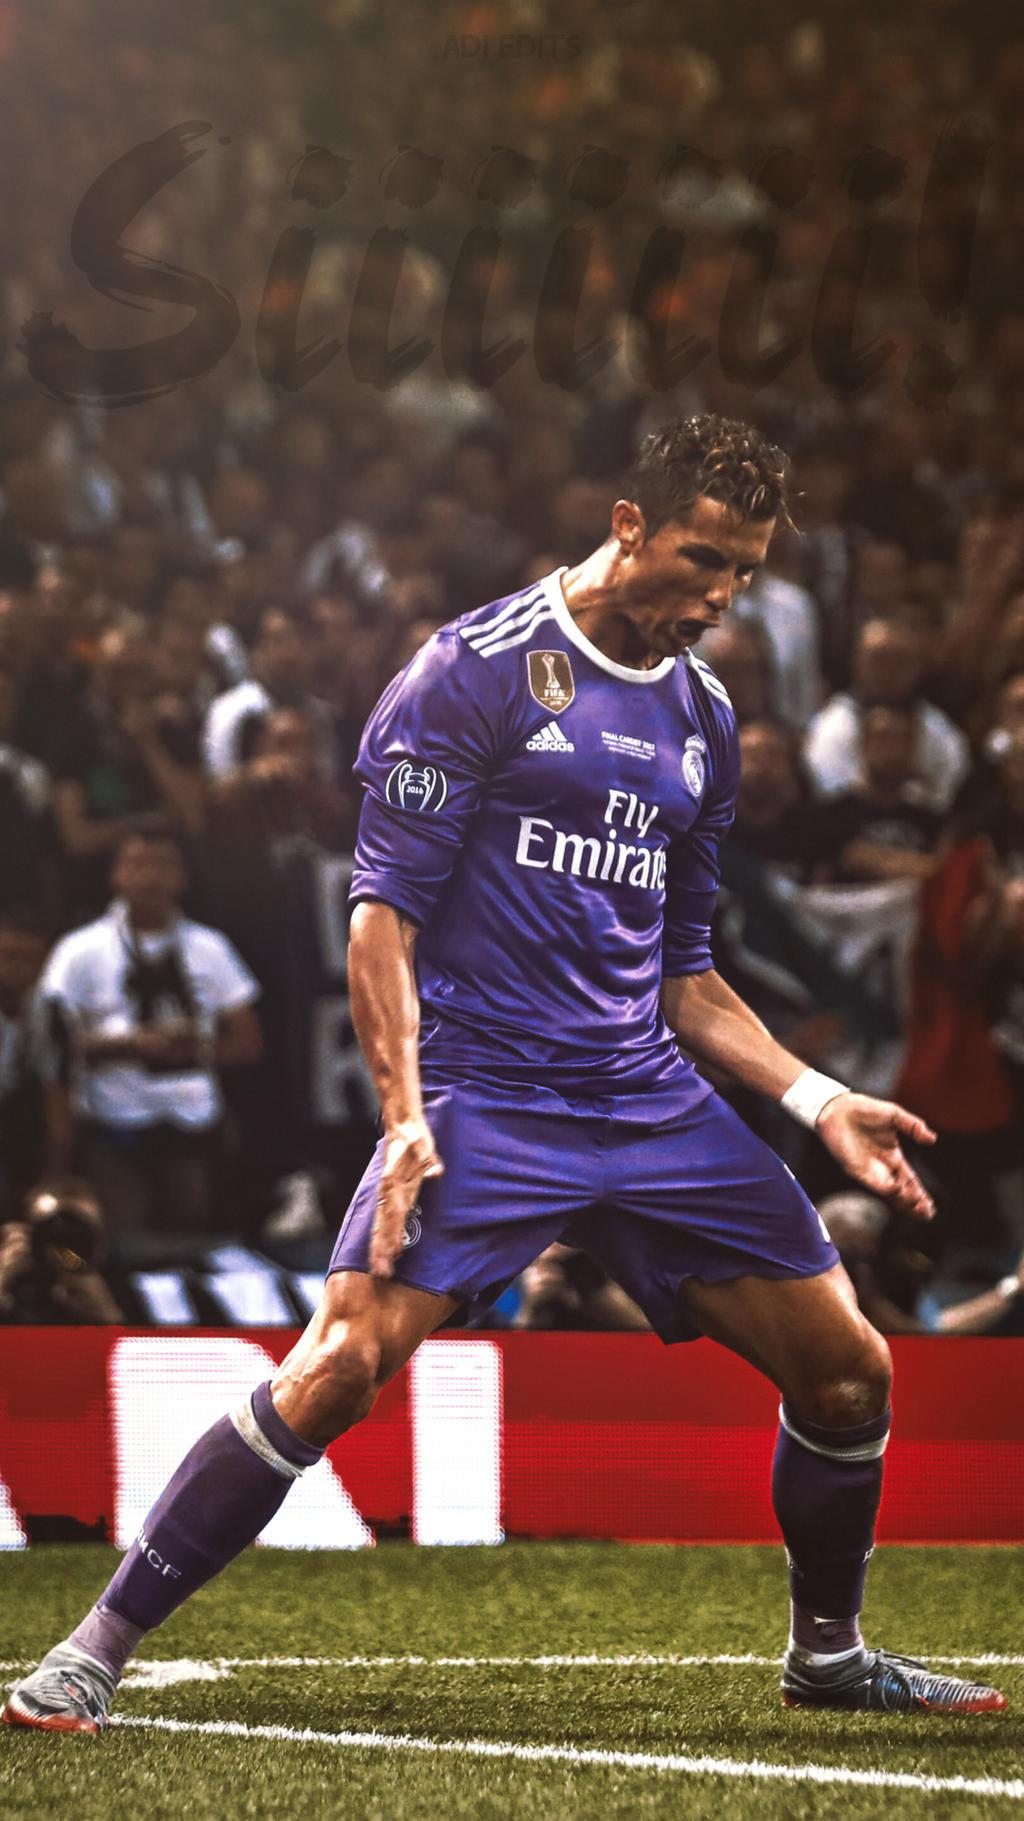 Cristiano Ronaldo Real Madrid Iphone Wallpaper Hd By Adi 149